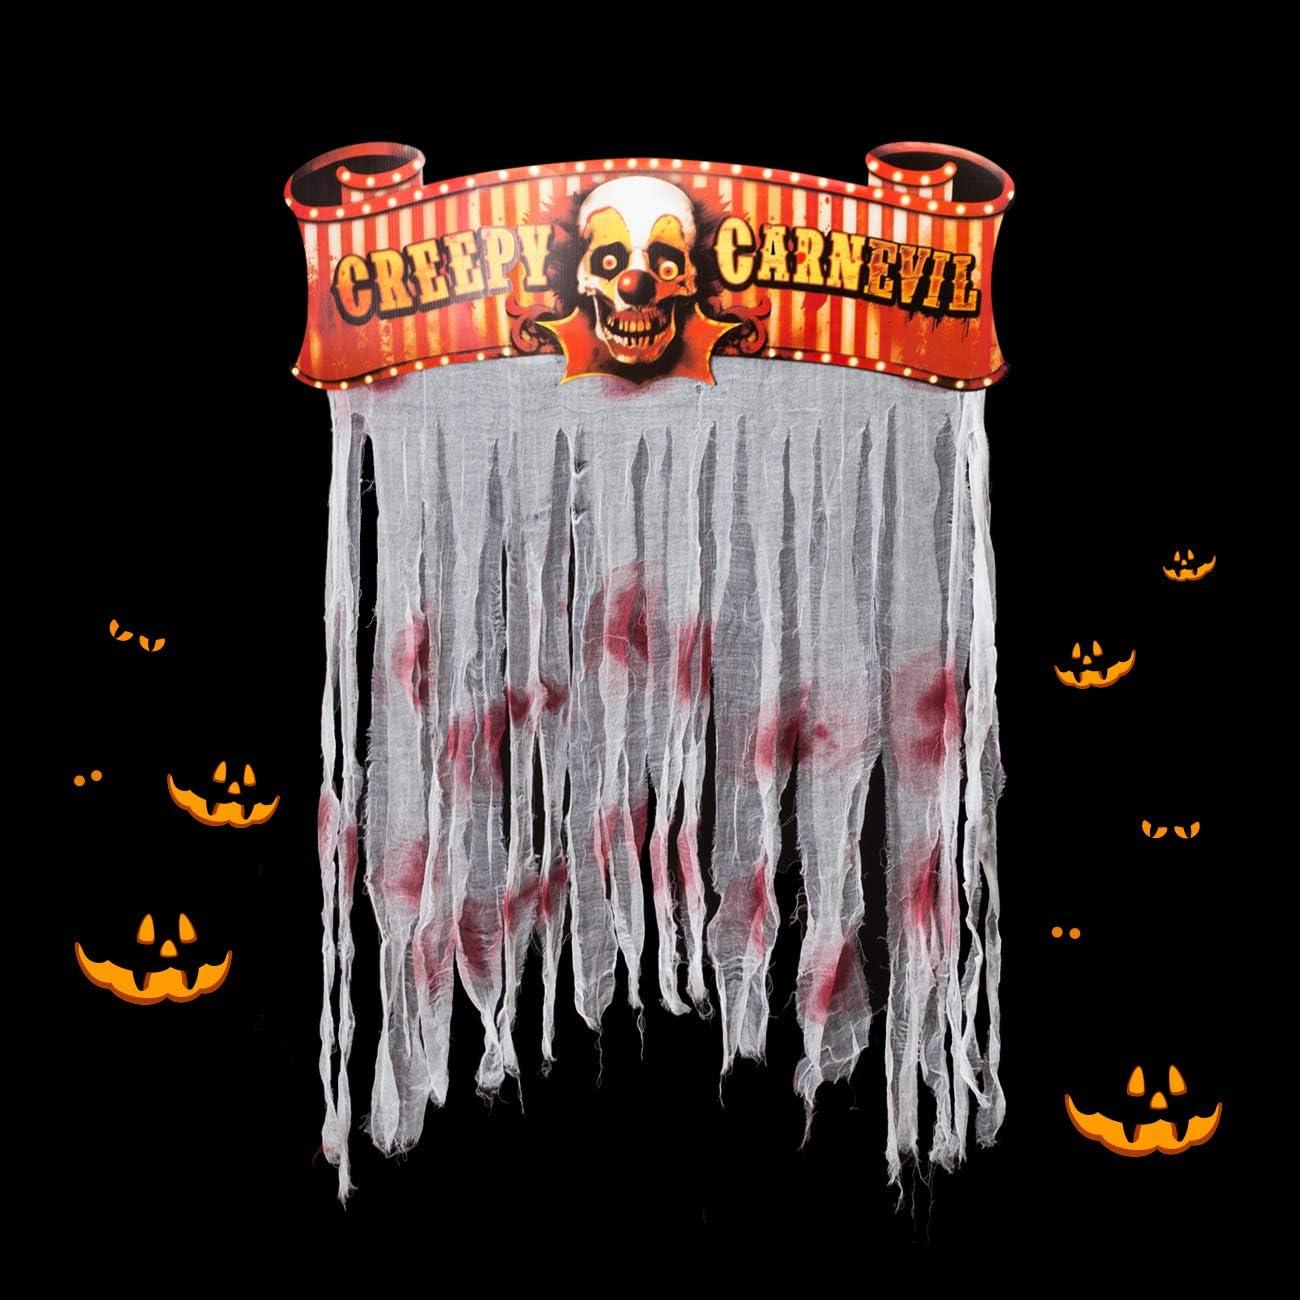 Kesoto Halloween Bloody Doorway Curtain Creepy Carnival Door Curtain Decoration, 54 x 38 in